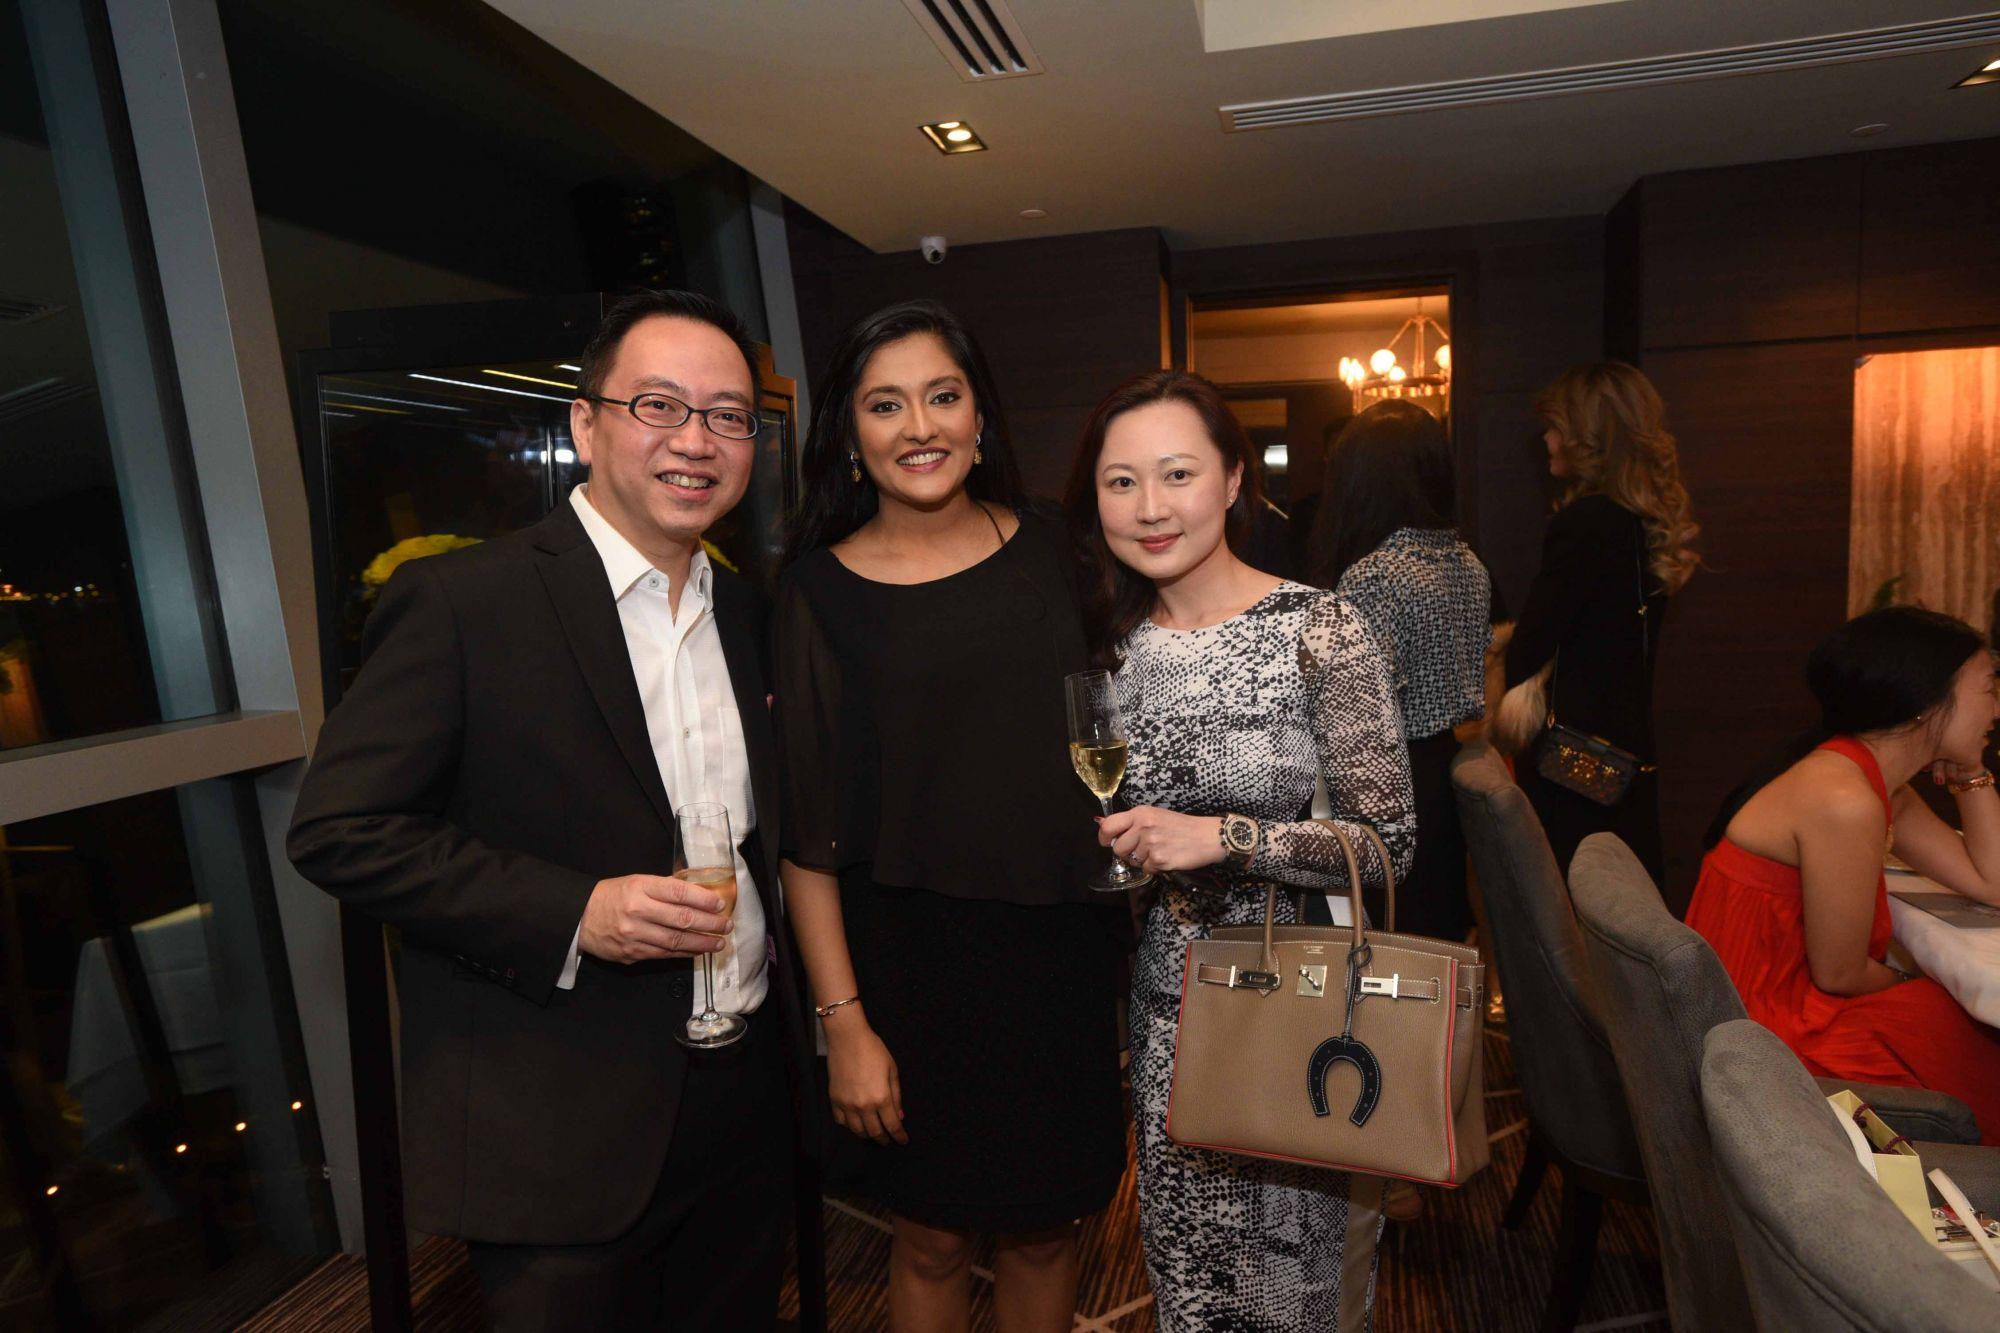 Christopher Chan, Vihari Sheth, Lee Li Lin